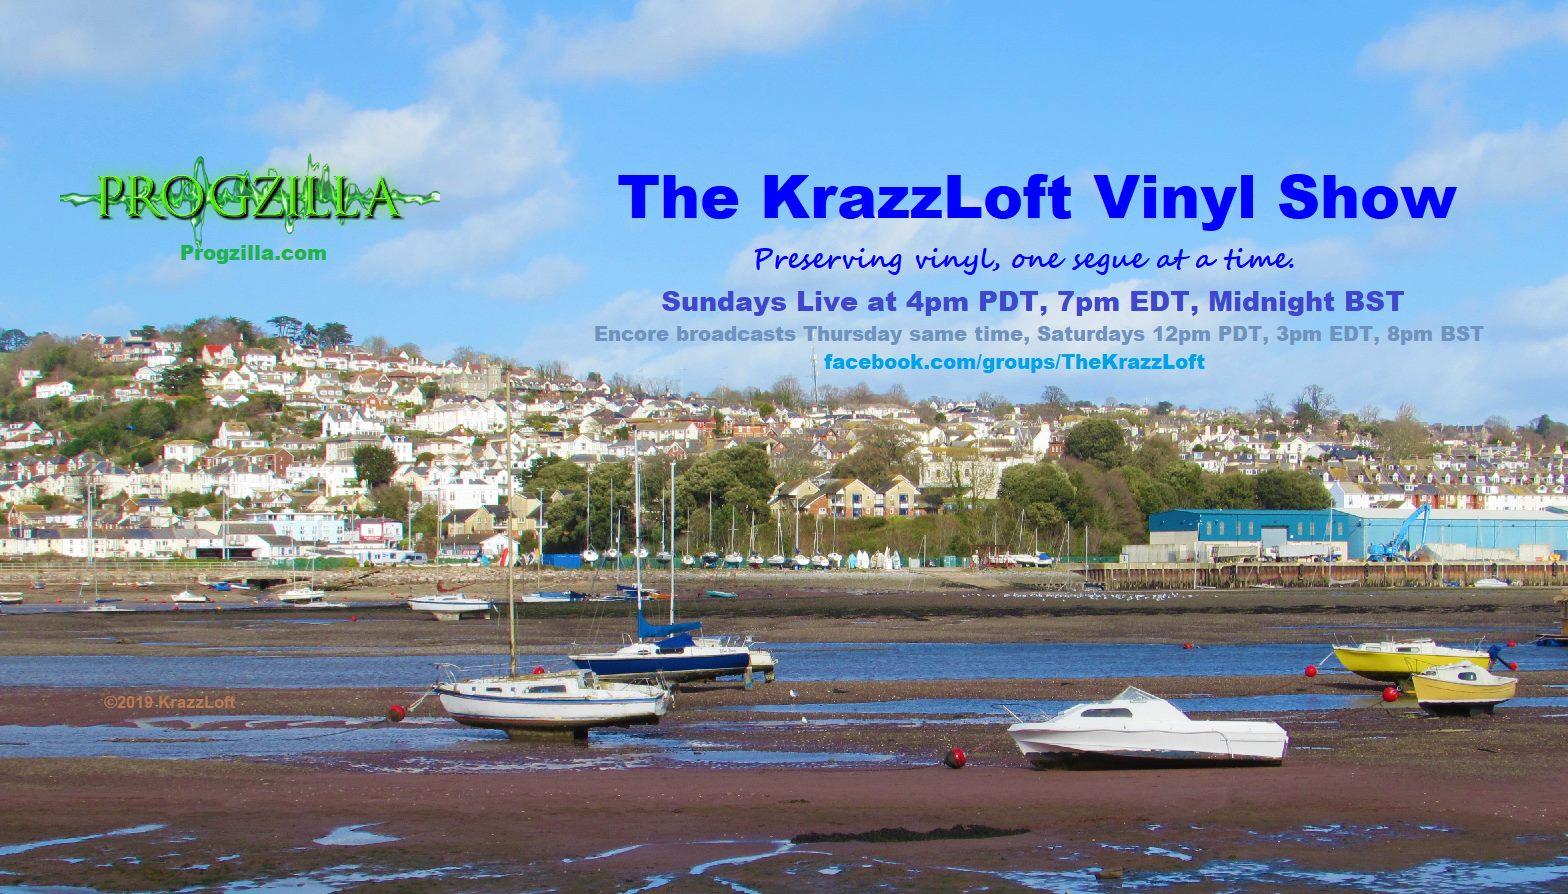 4Pm Bst podcast 66: krazzloft vinyl show 21st july 2019 - progzilla